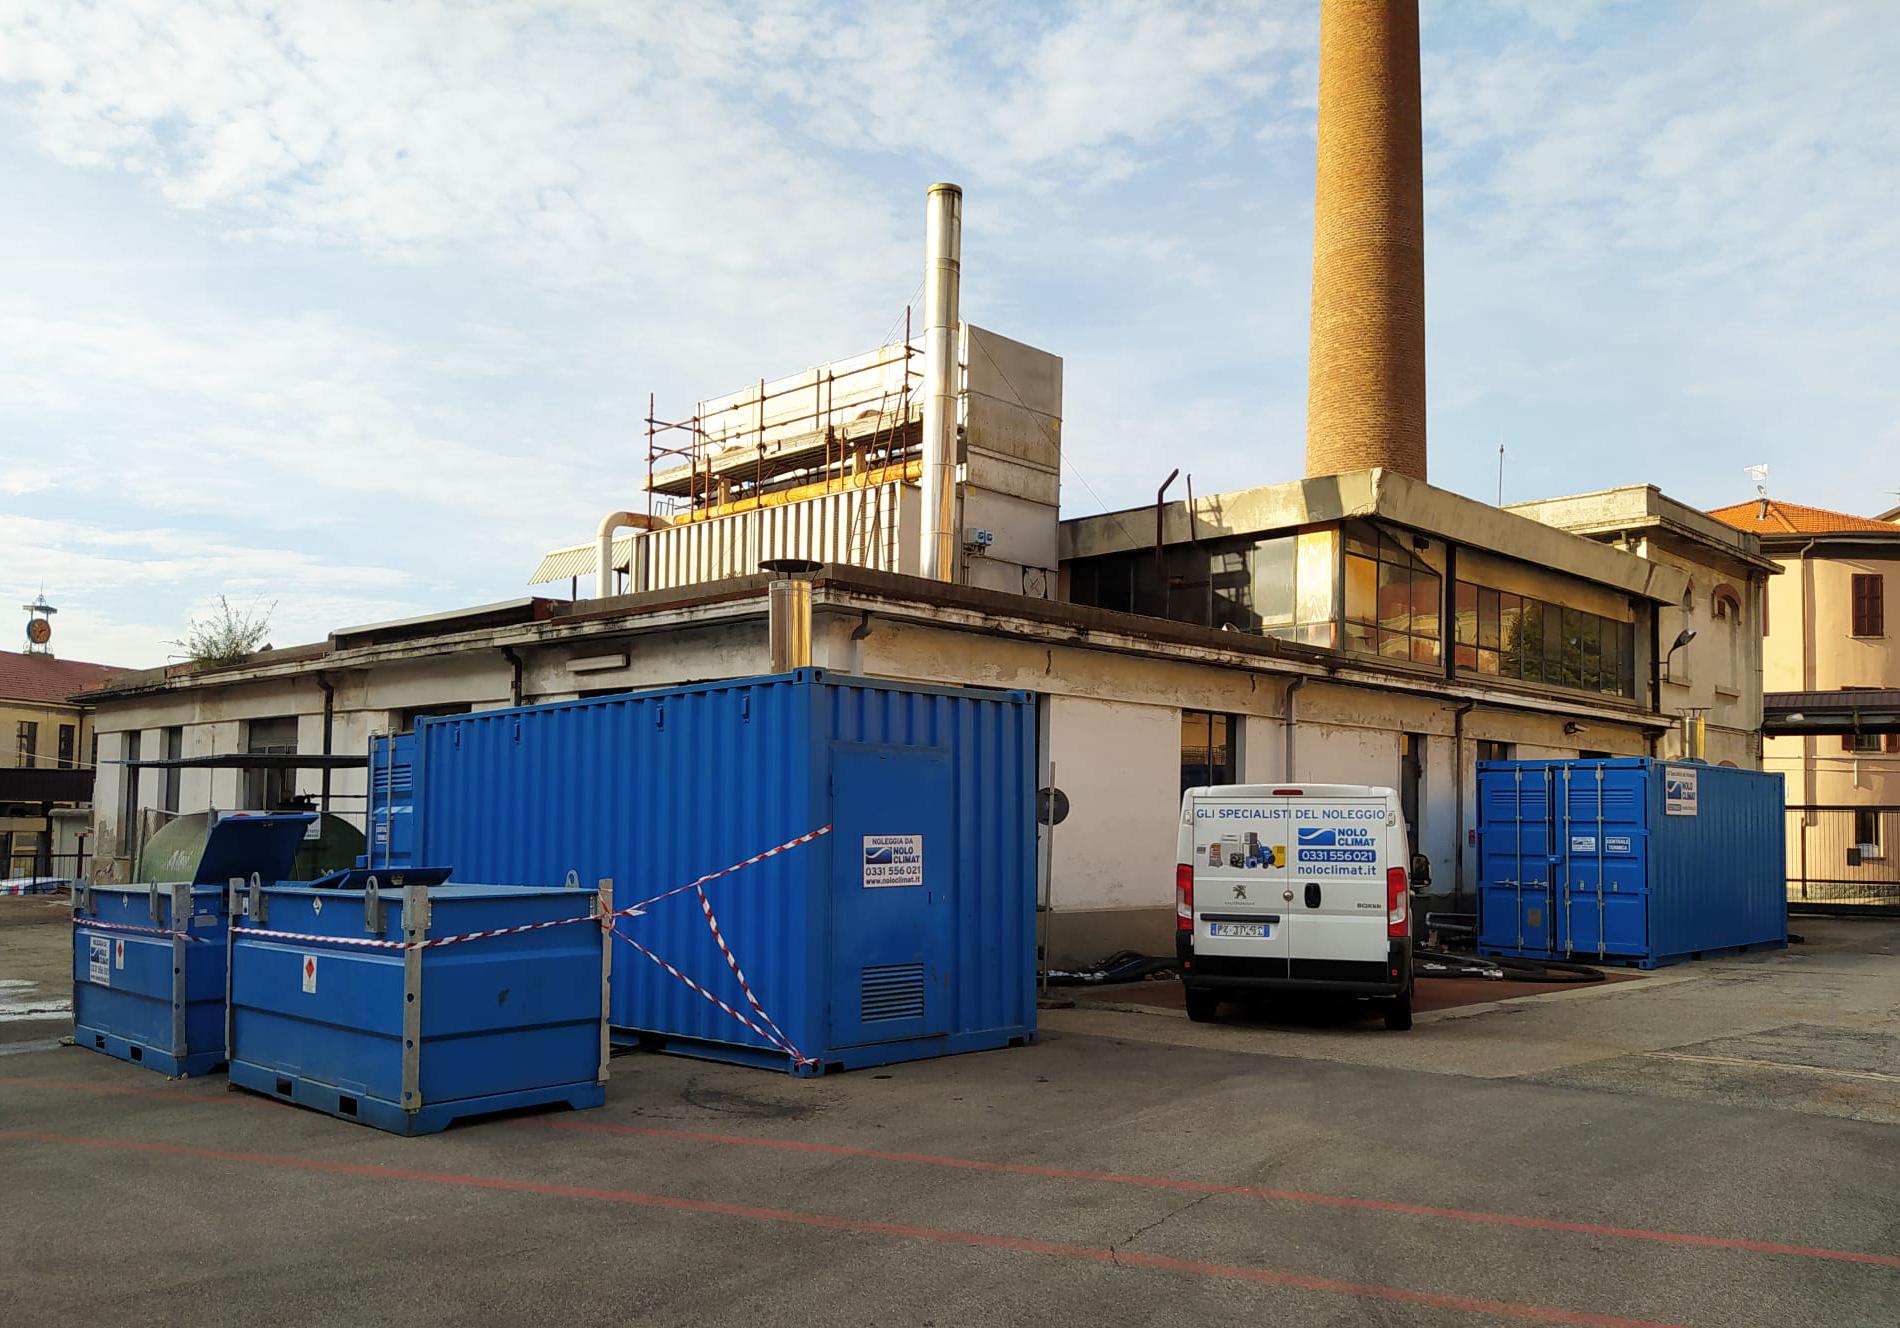 Caldaie da 1500 kW scaldano un ospedale lombardo